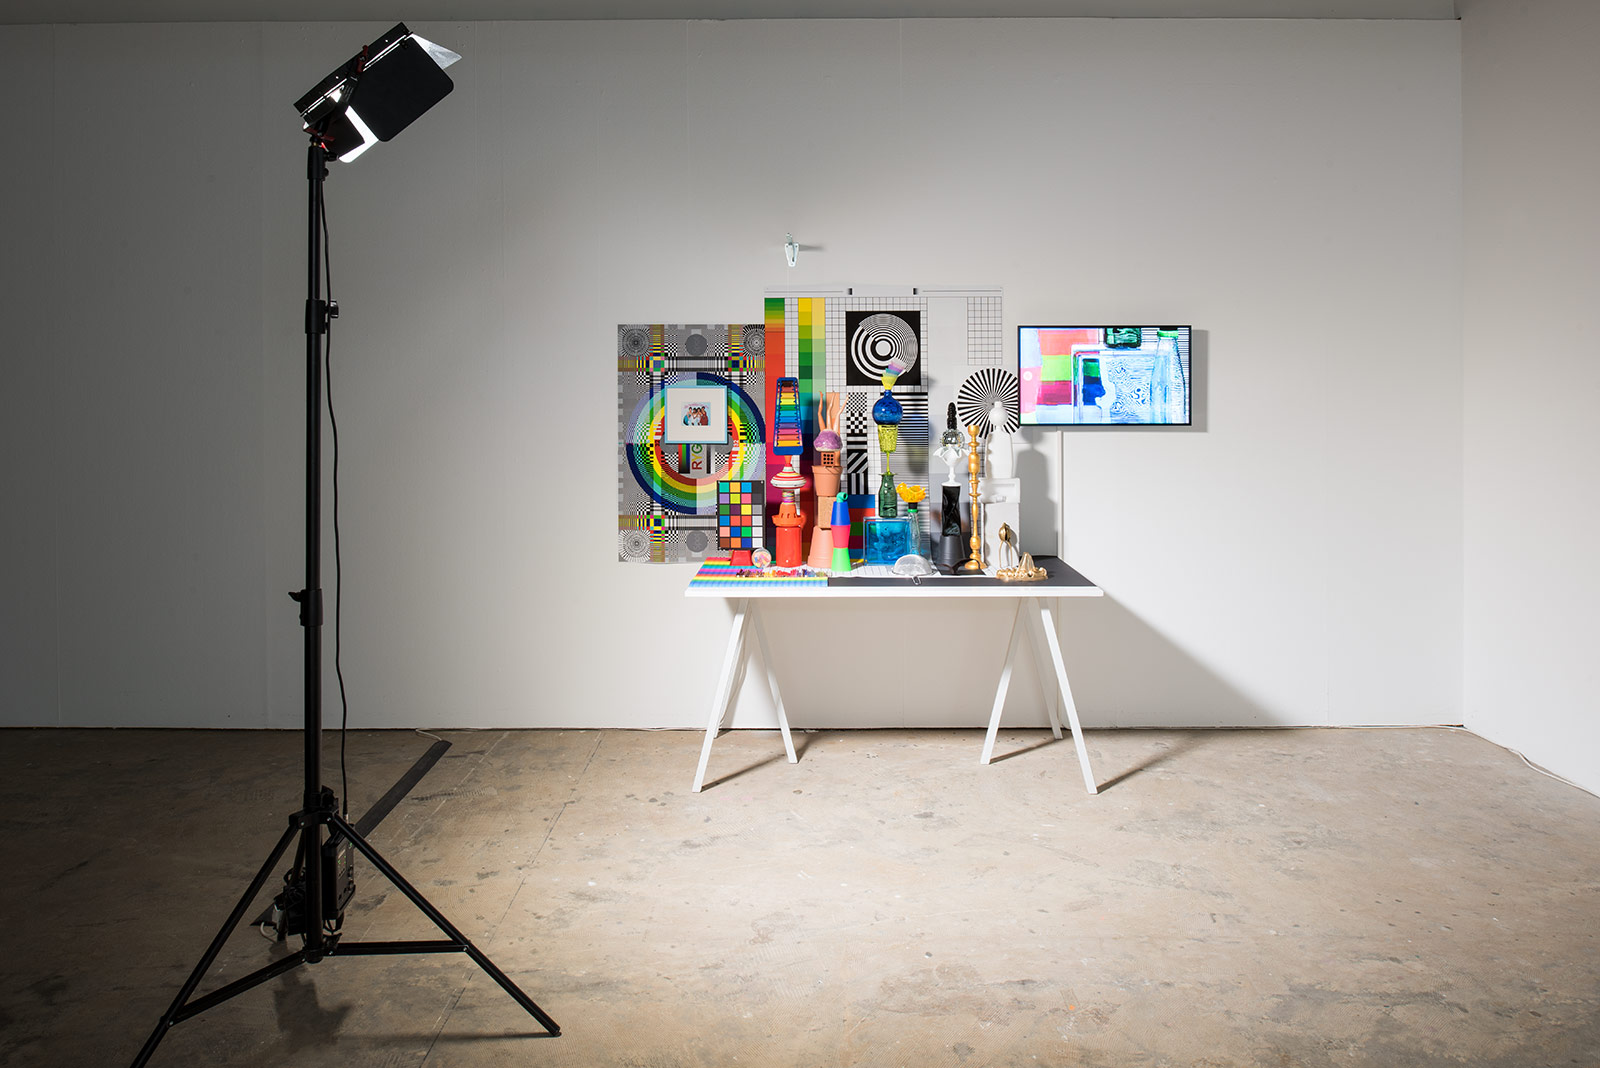 Tamara Janes – Institut Kunst, Diplom 2017